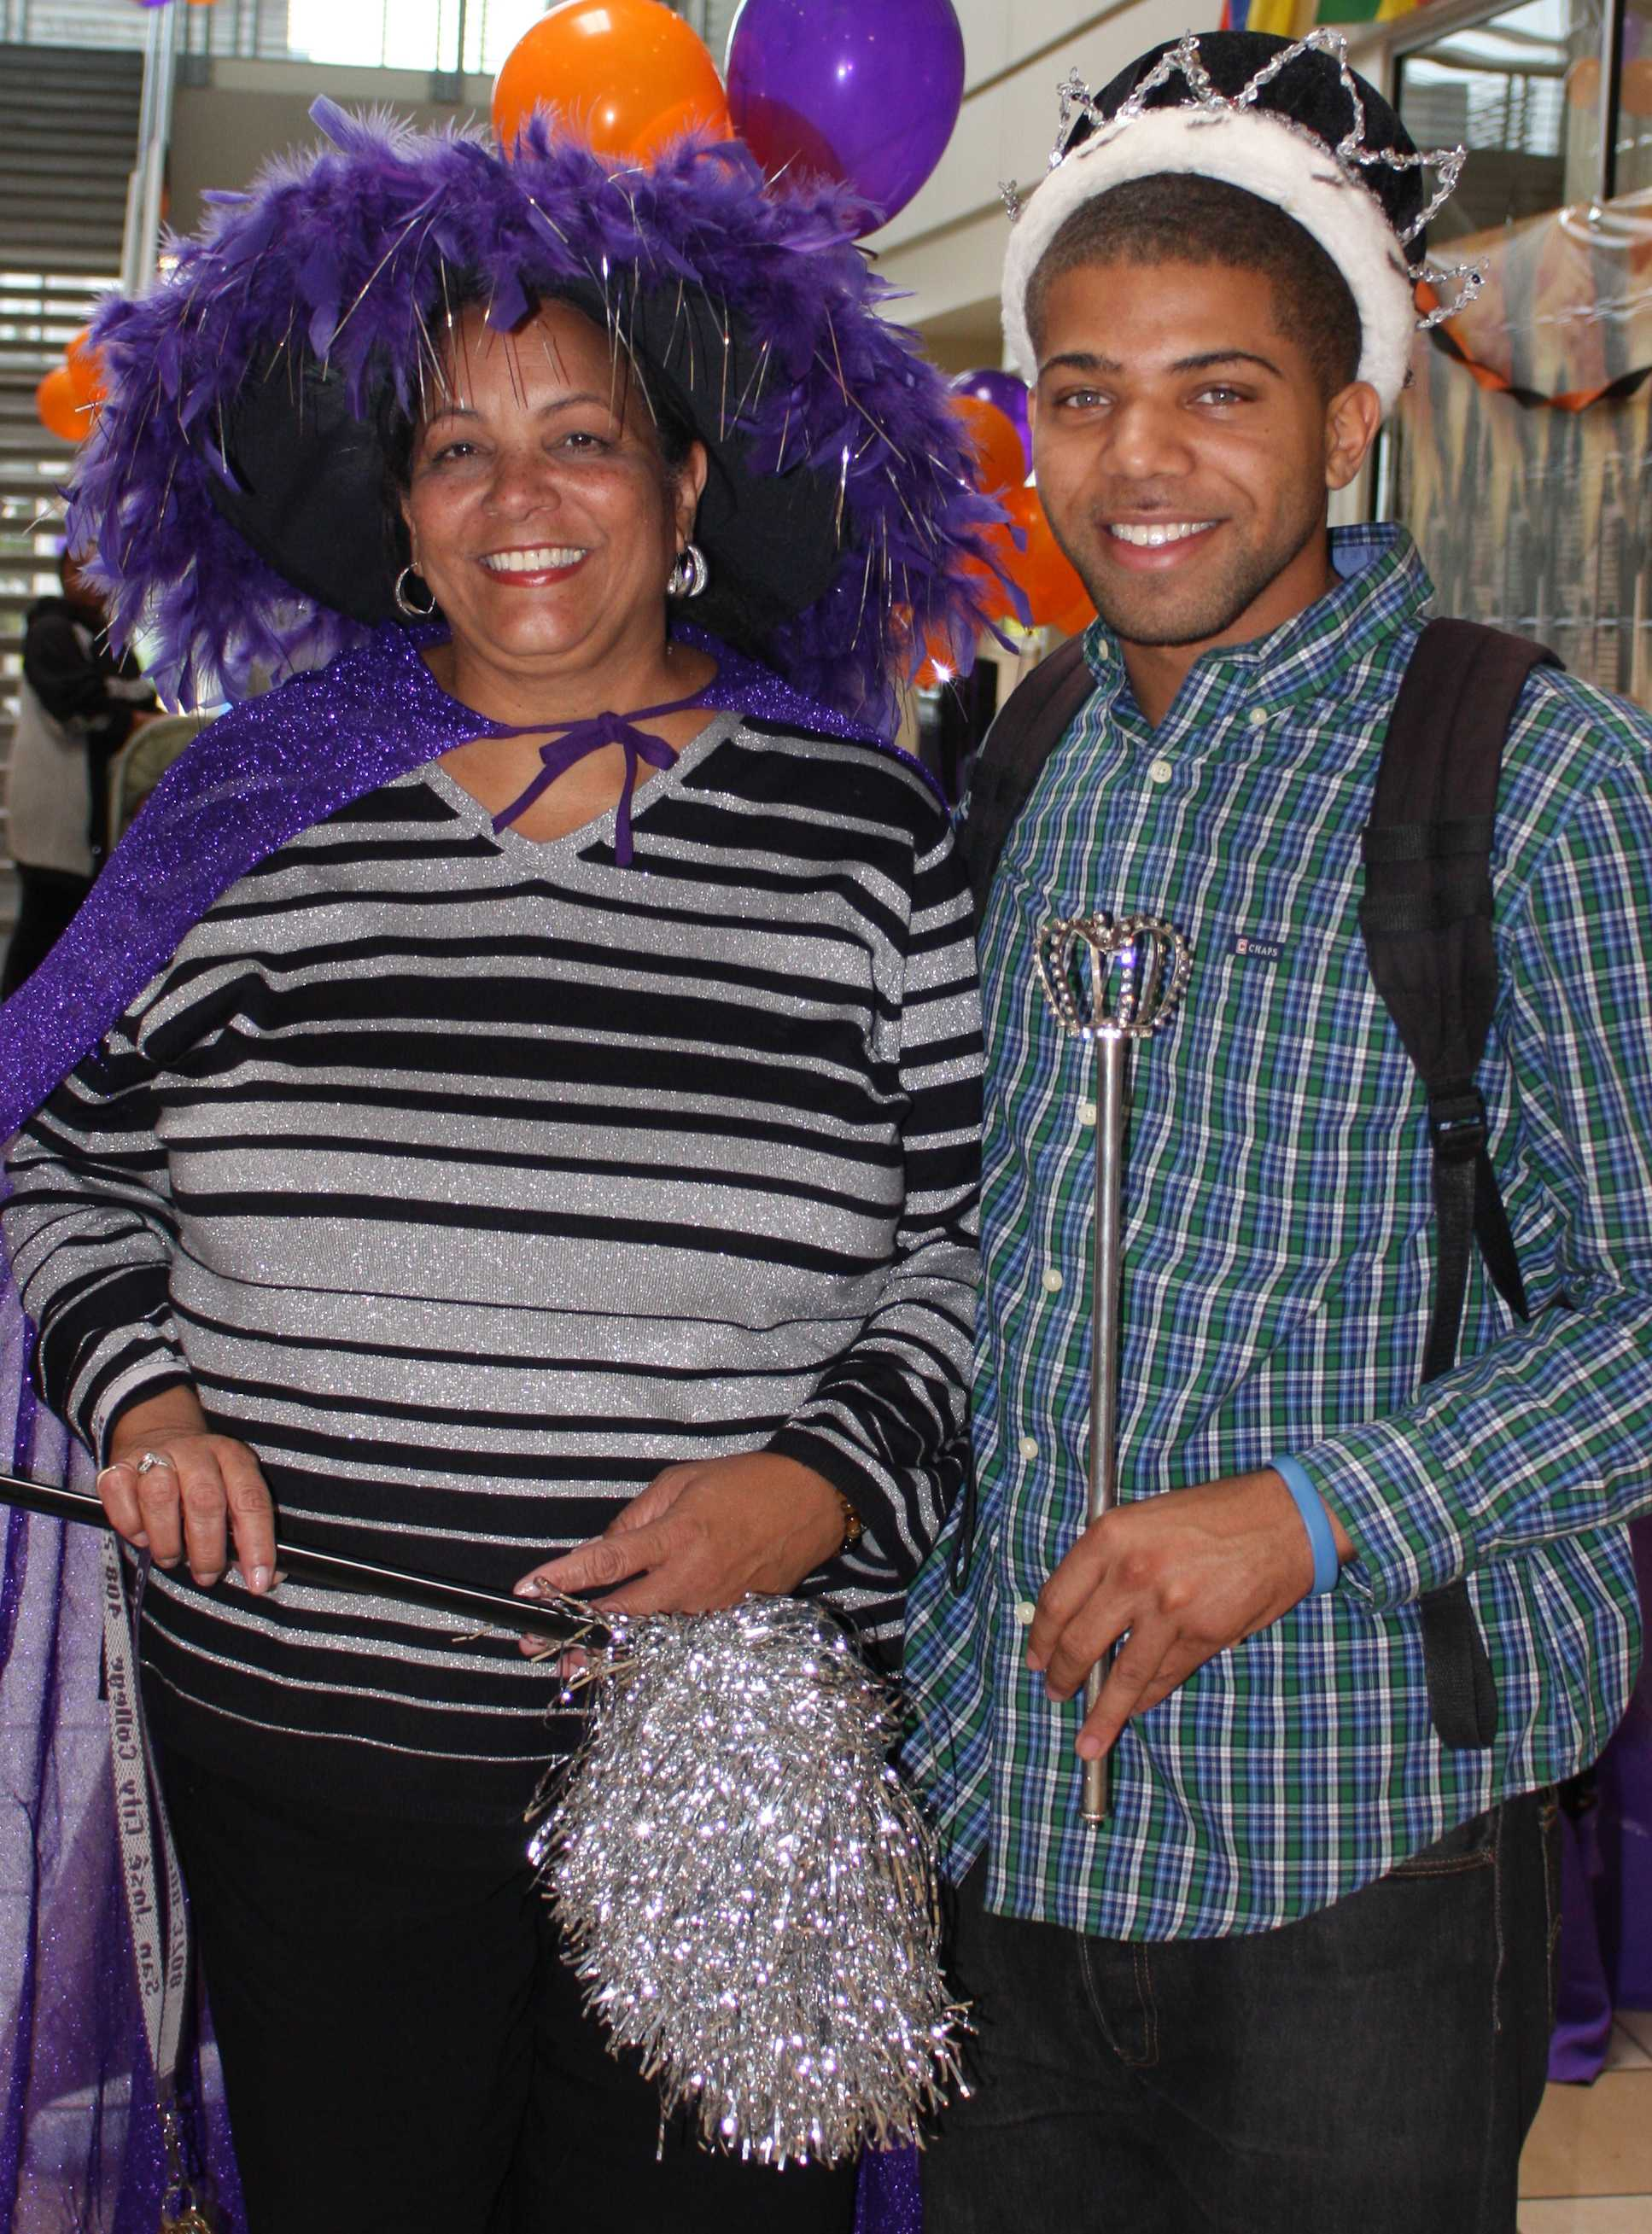 Halloween photos from San Jose City College